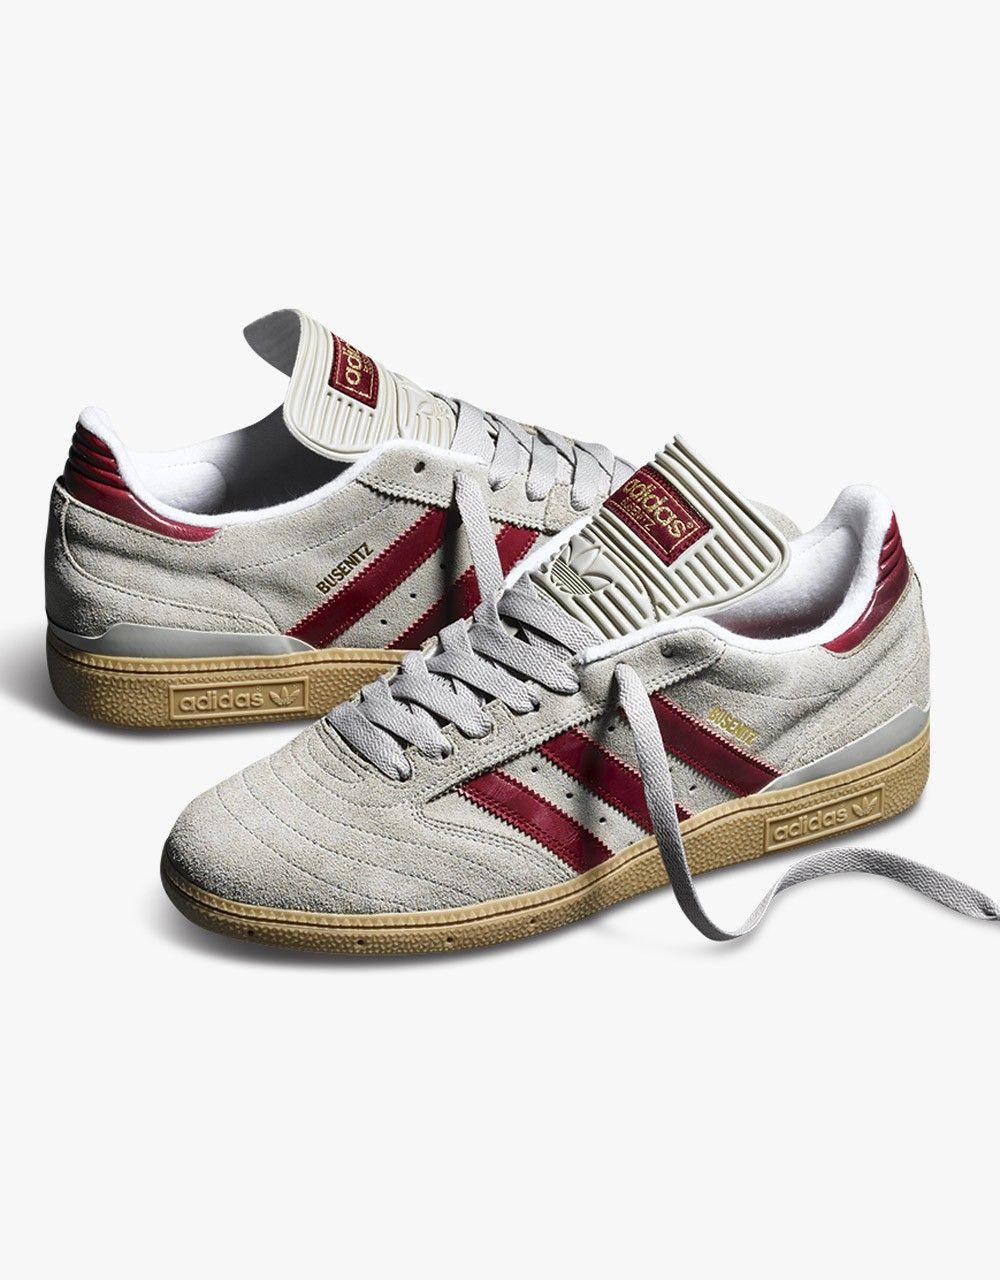 Adidas Busenitz Pro Skate Shoes - Sesame Cardinal White  abcc6ea7b